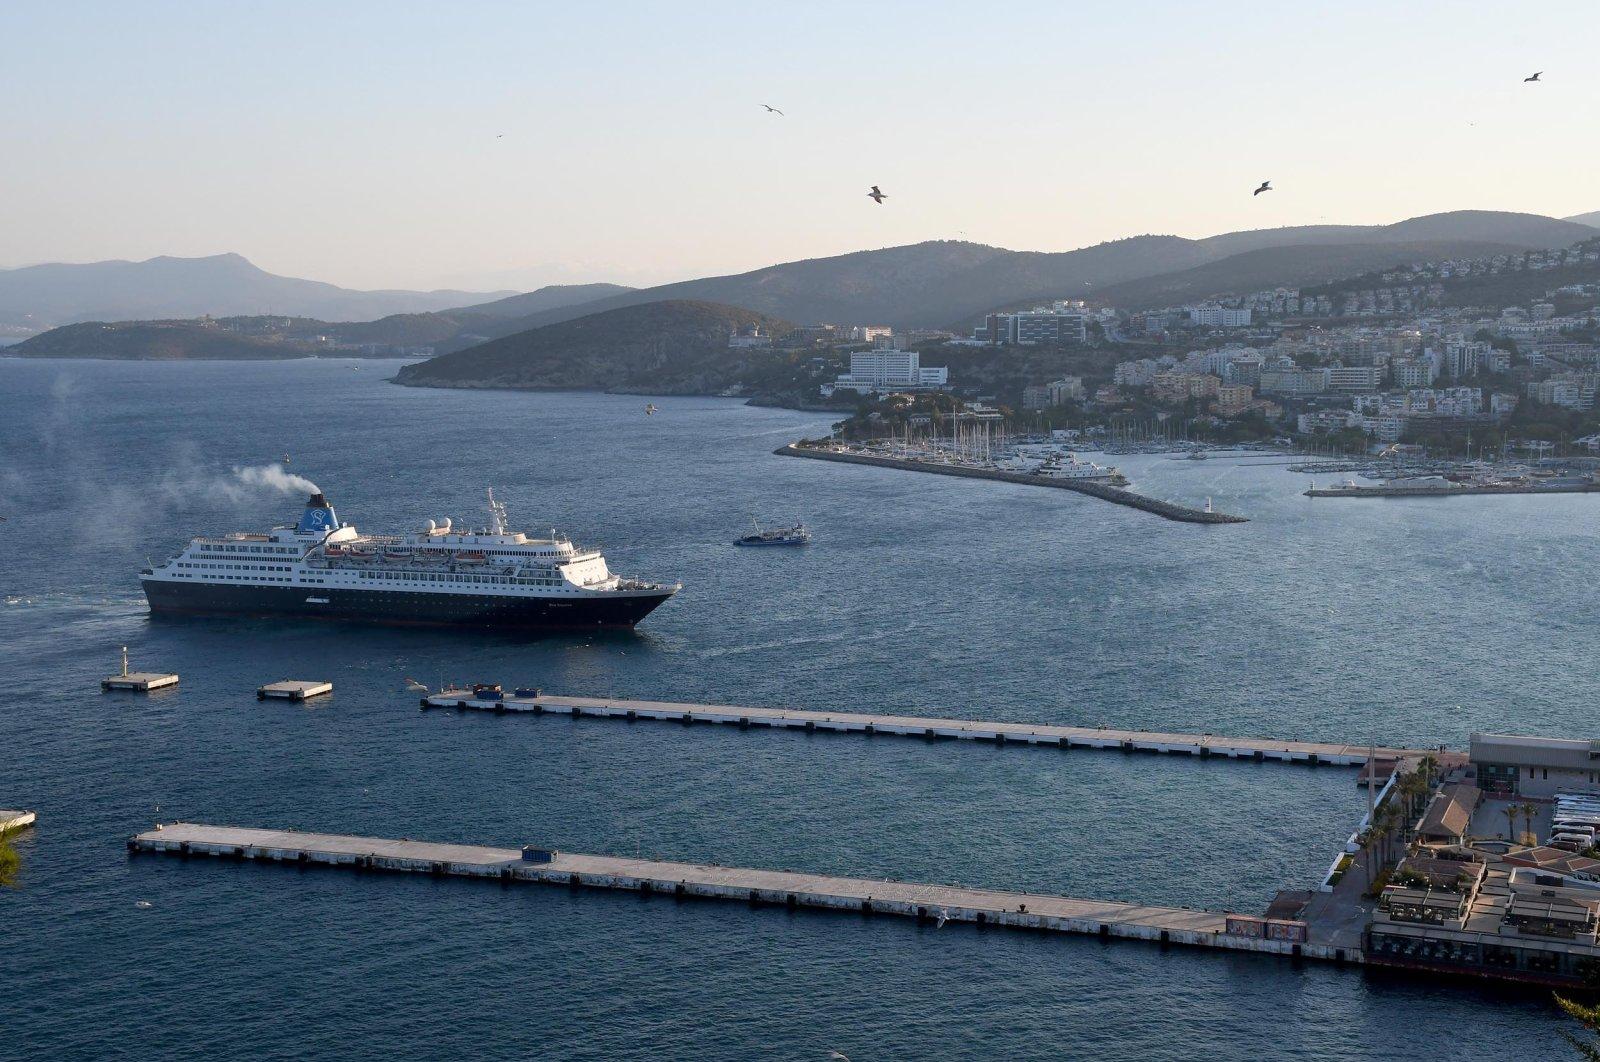 A cruise ship approaches Ege Port on Kuşadası in Aydın province,southwestern Turkey, Sept. 2, 2021. (DHA Photo)